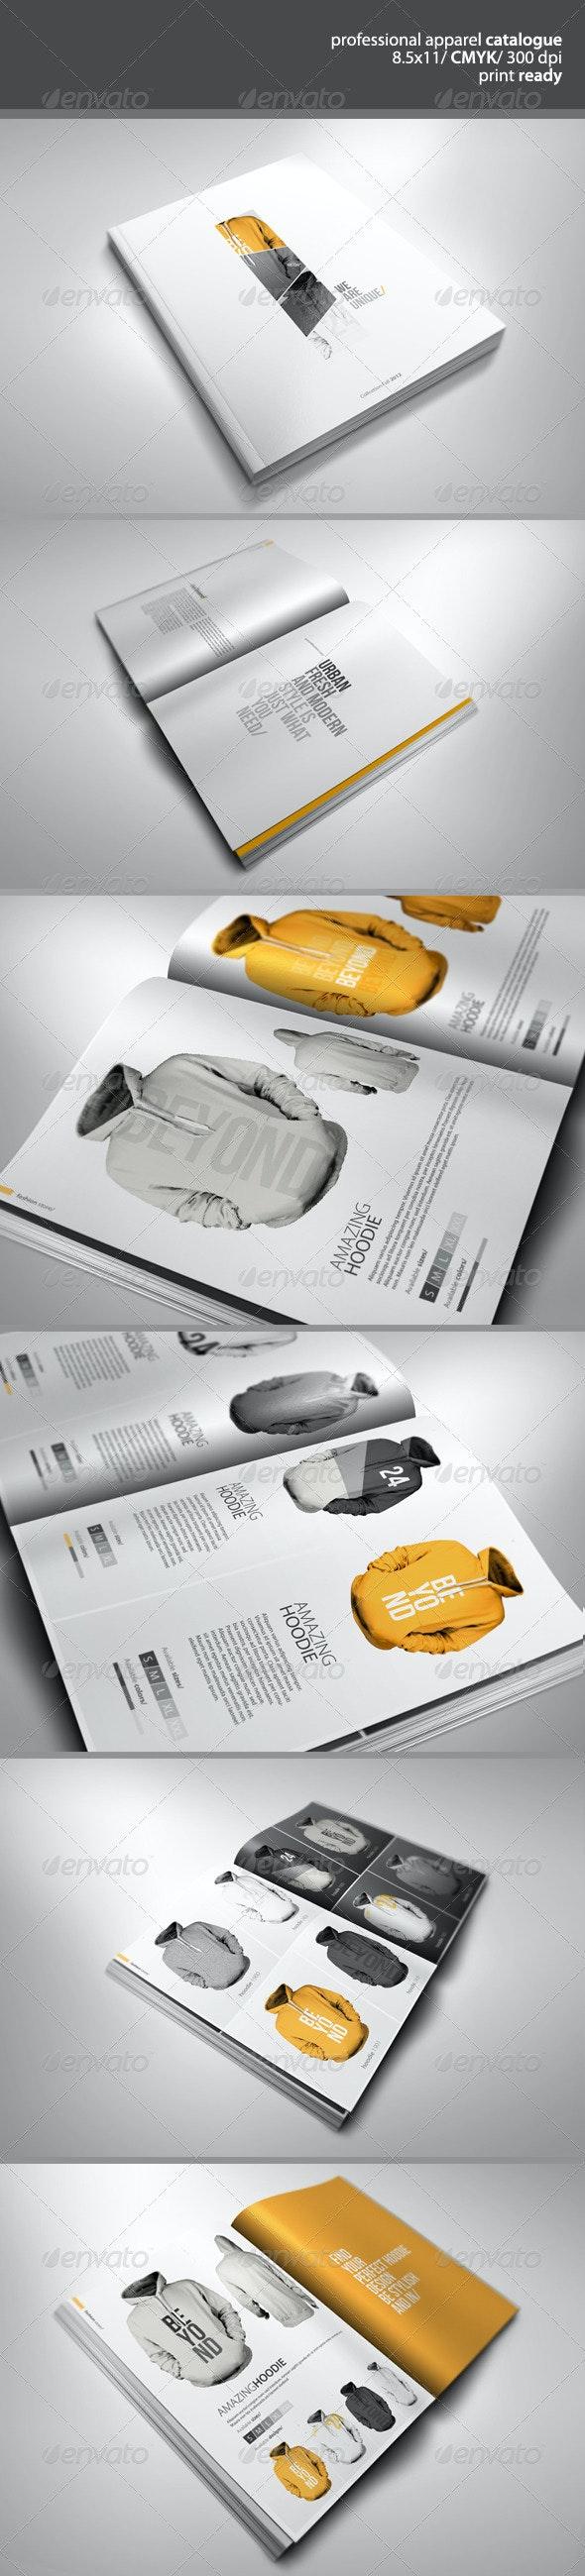 Professional Apparel Catalogue - Catalogs Brochures